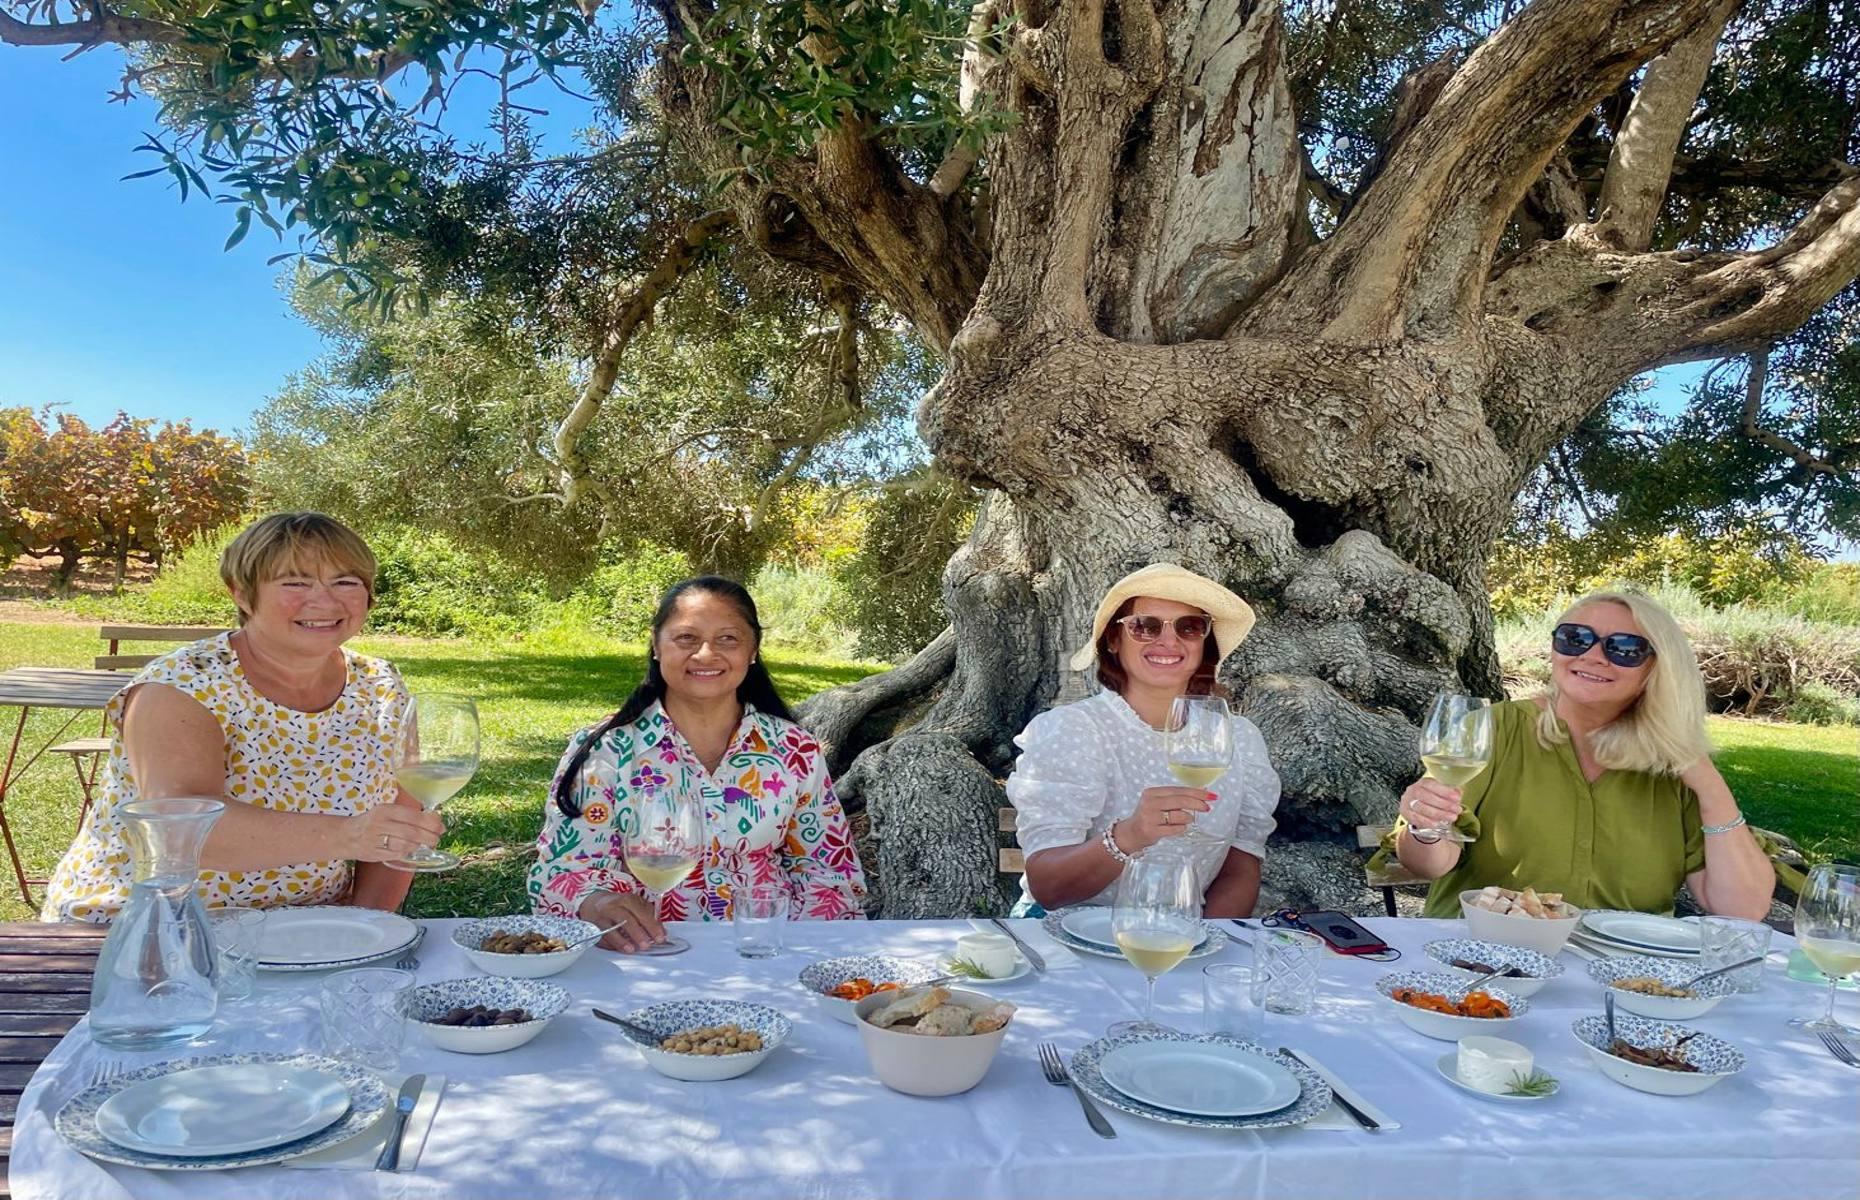 Under the olive tree at Morgado do Quintao (Image: Antonia Windsor)